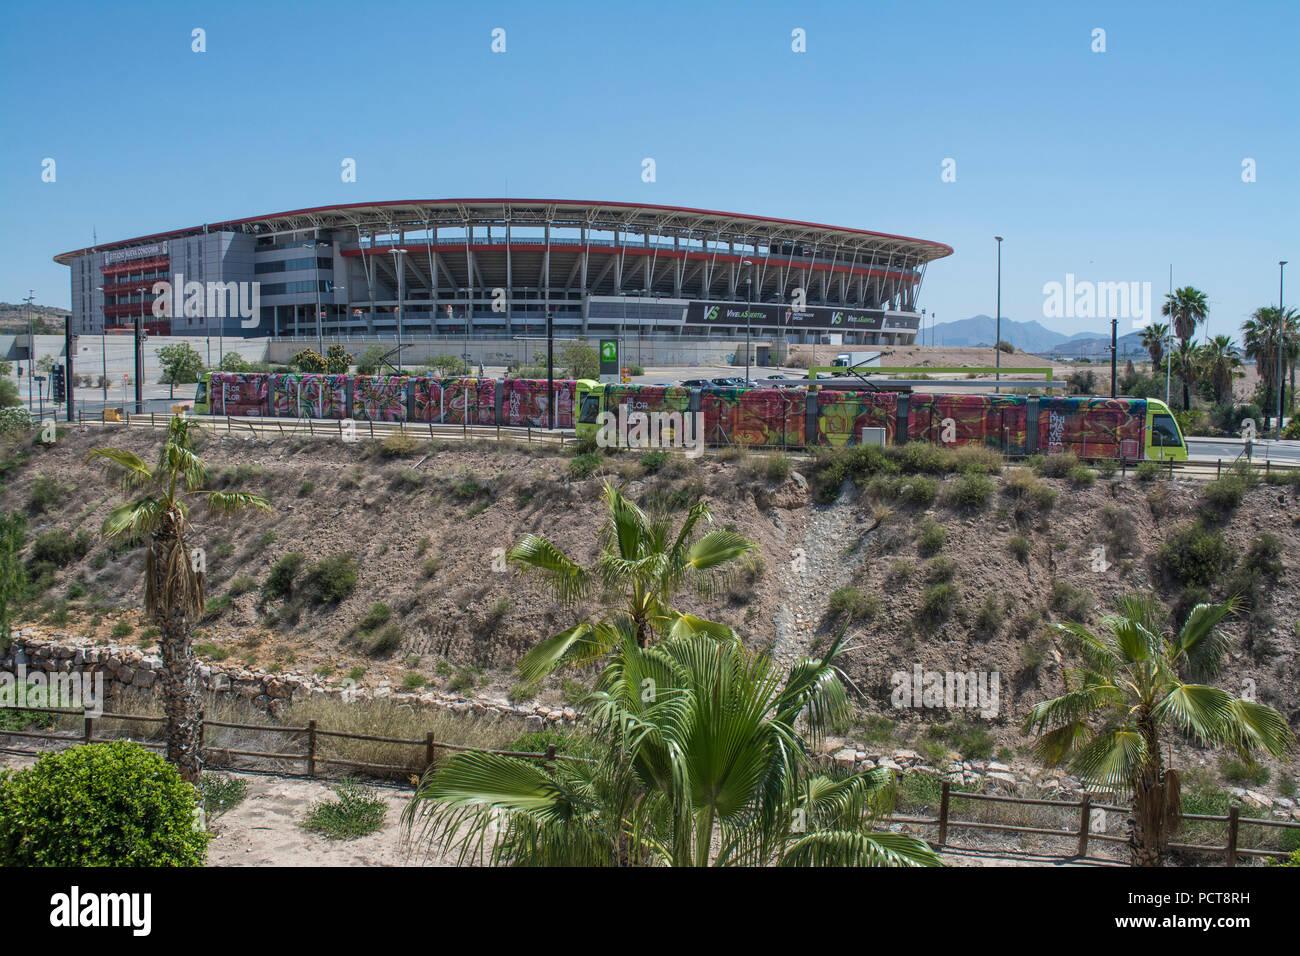 Tram outside the Estadio Nueva Condomina home of Spanish football team Real Murcia - Stock Image